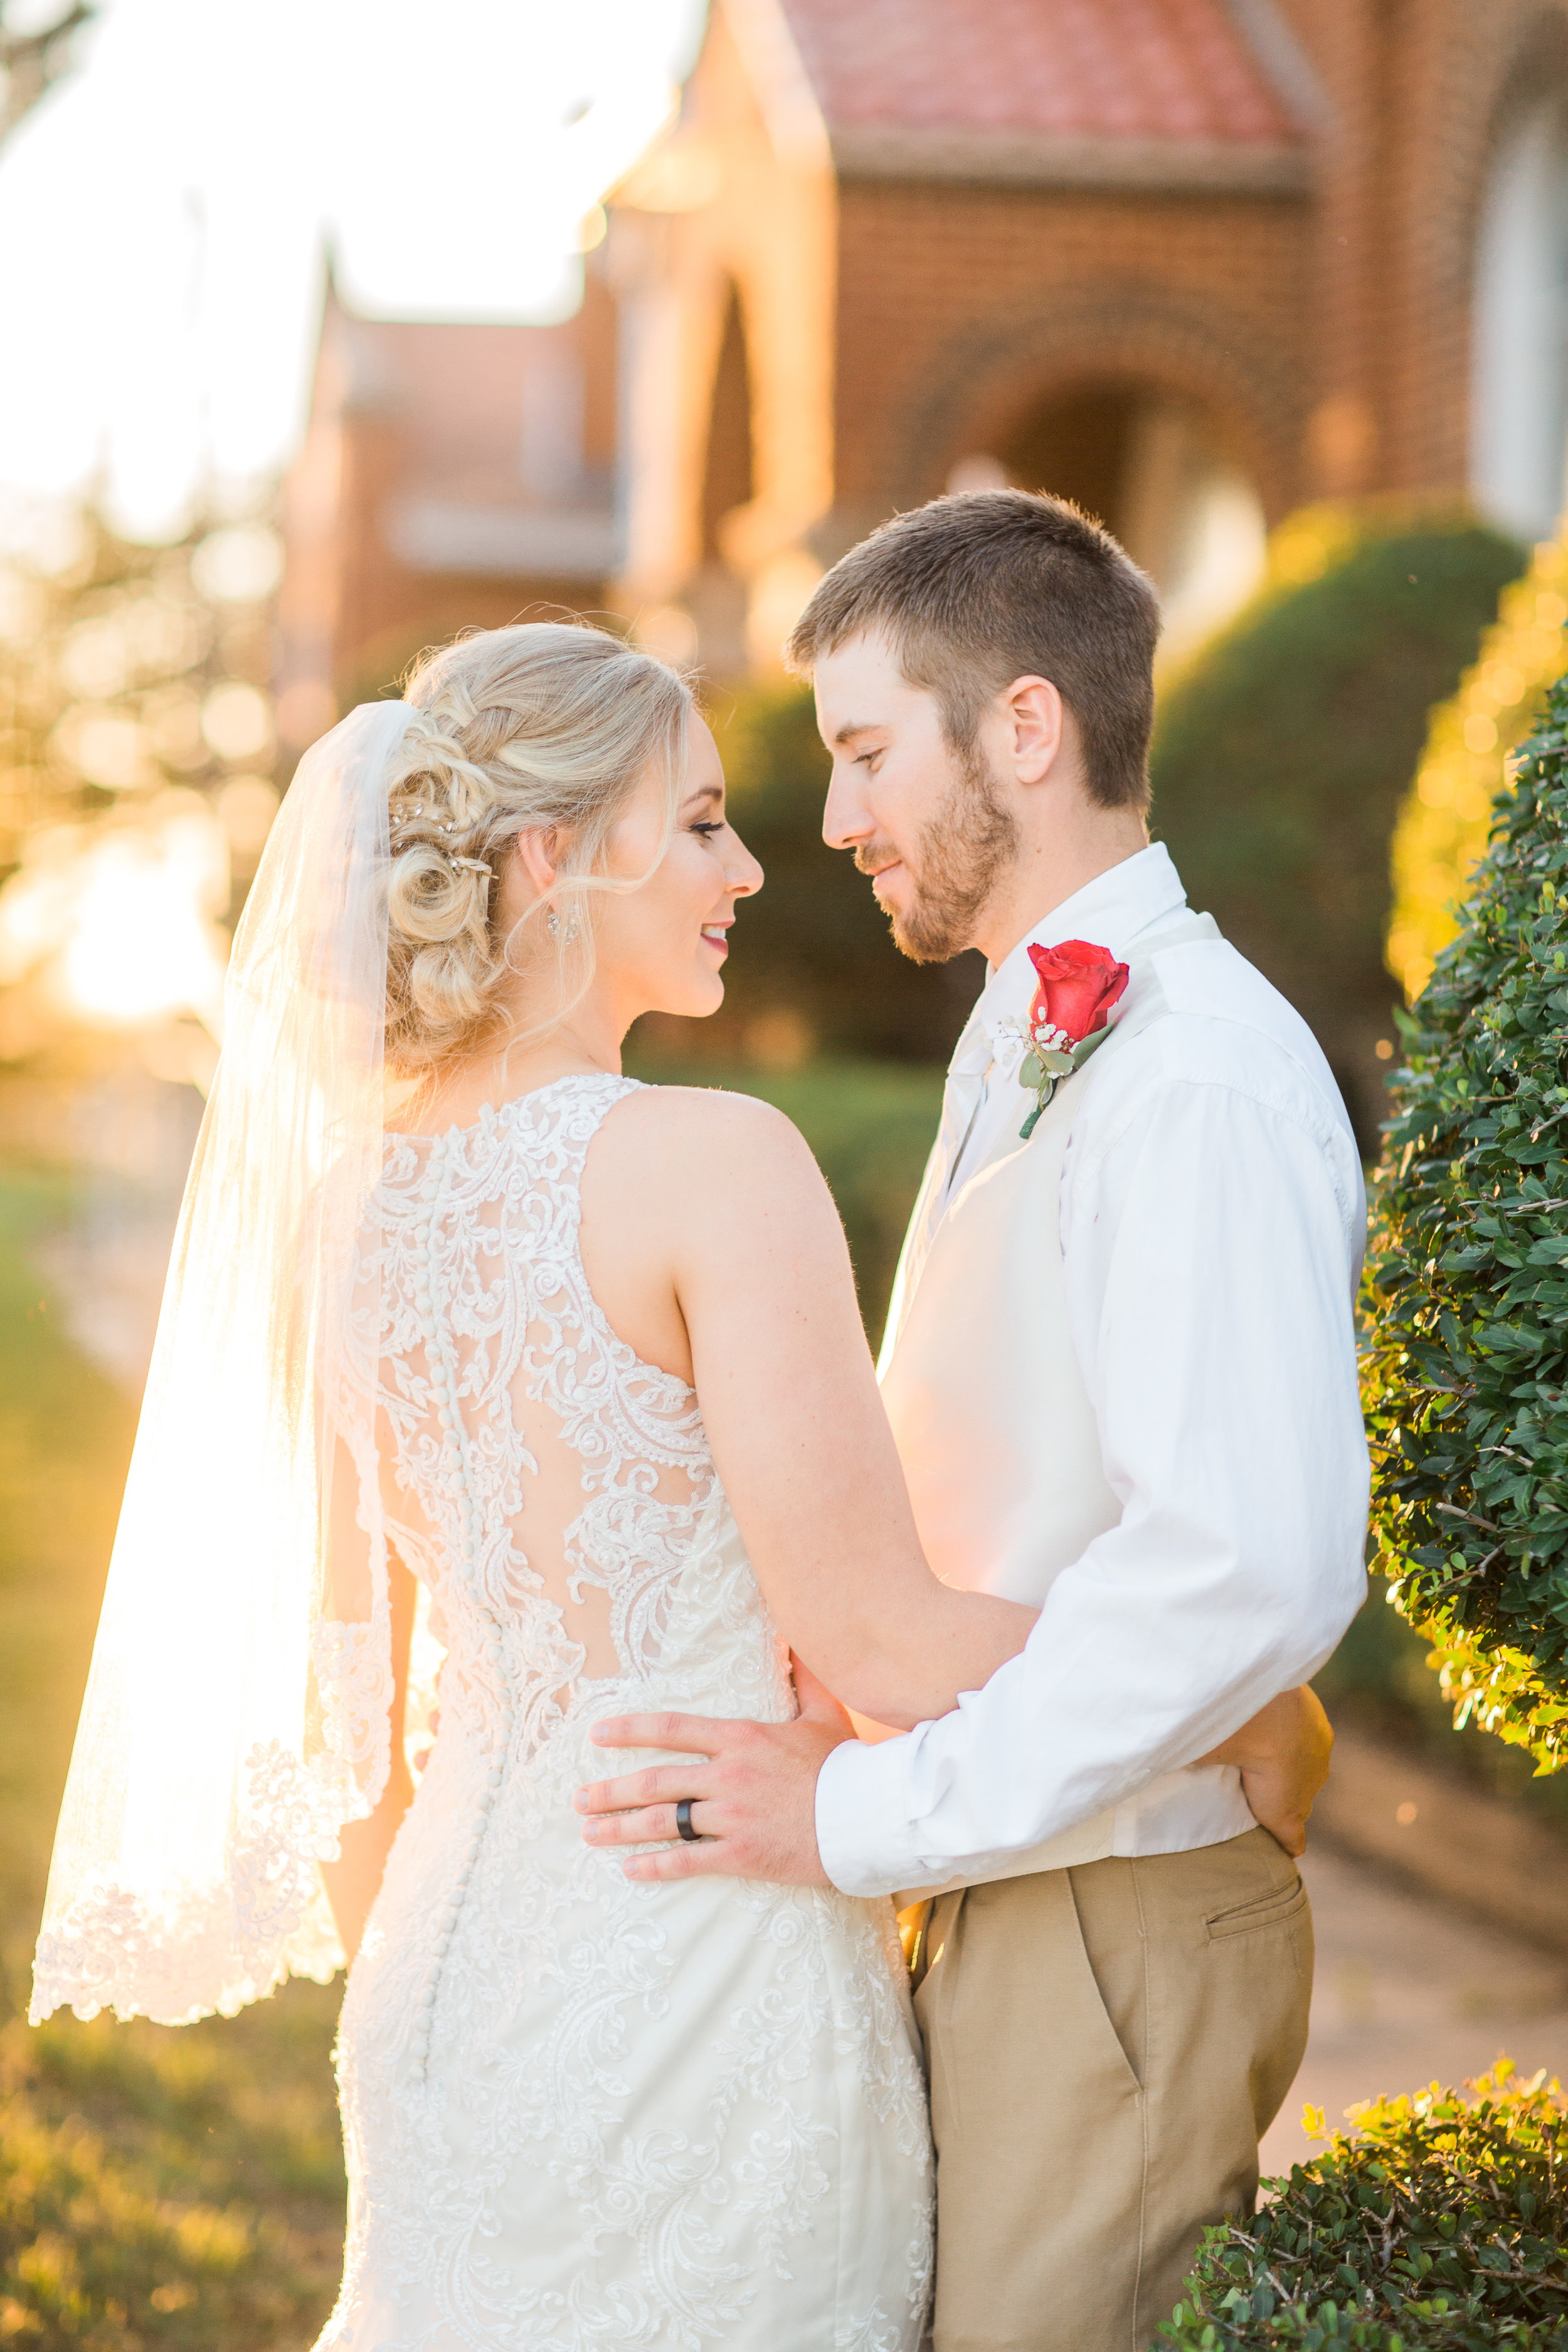 Bailey-Nathan-Windthorst-Texas-Wedding-058.jpg